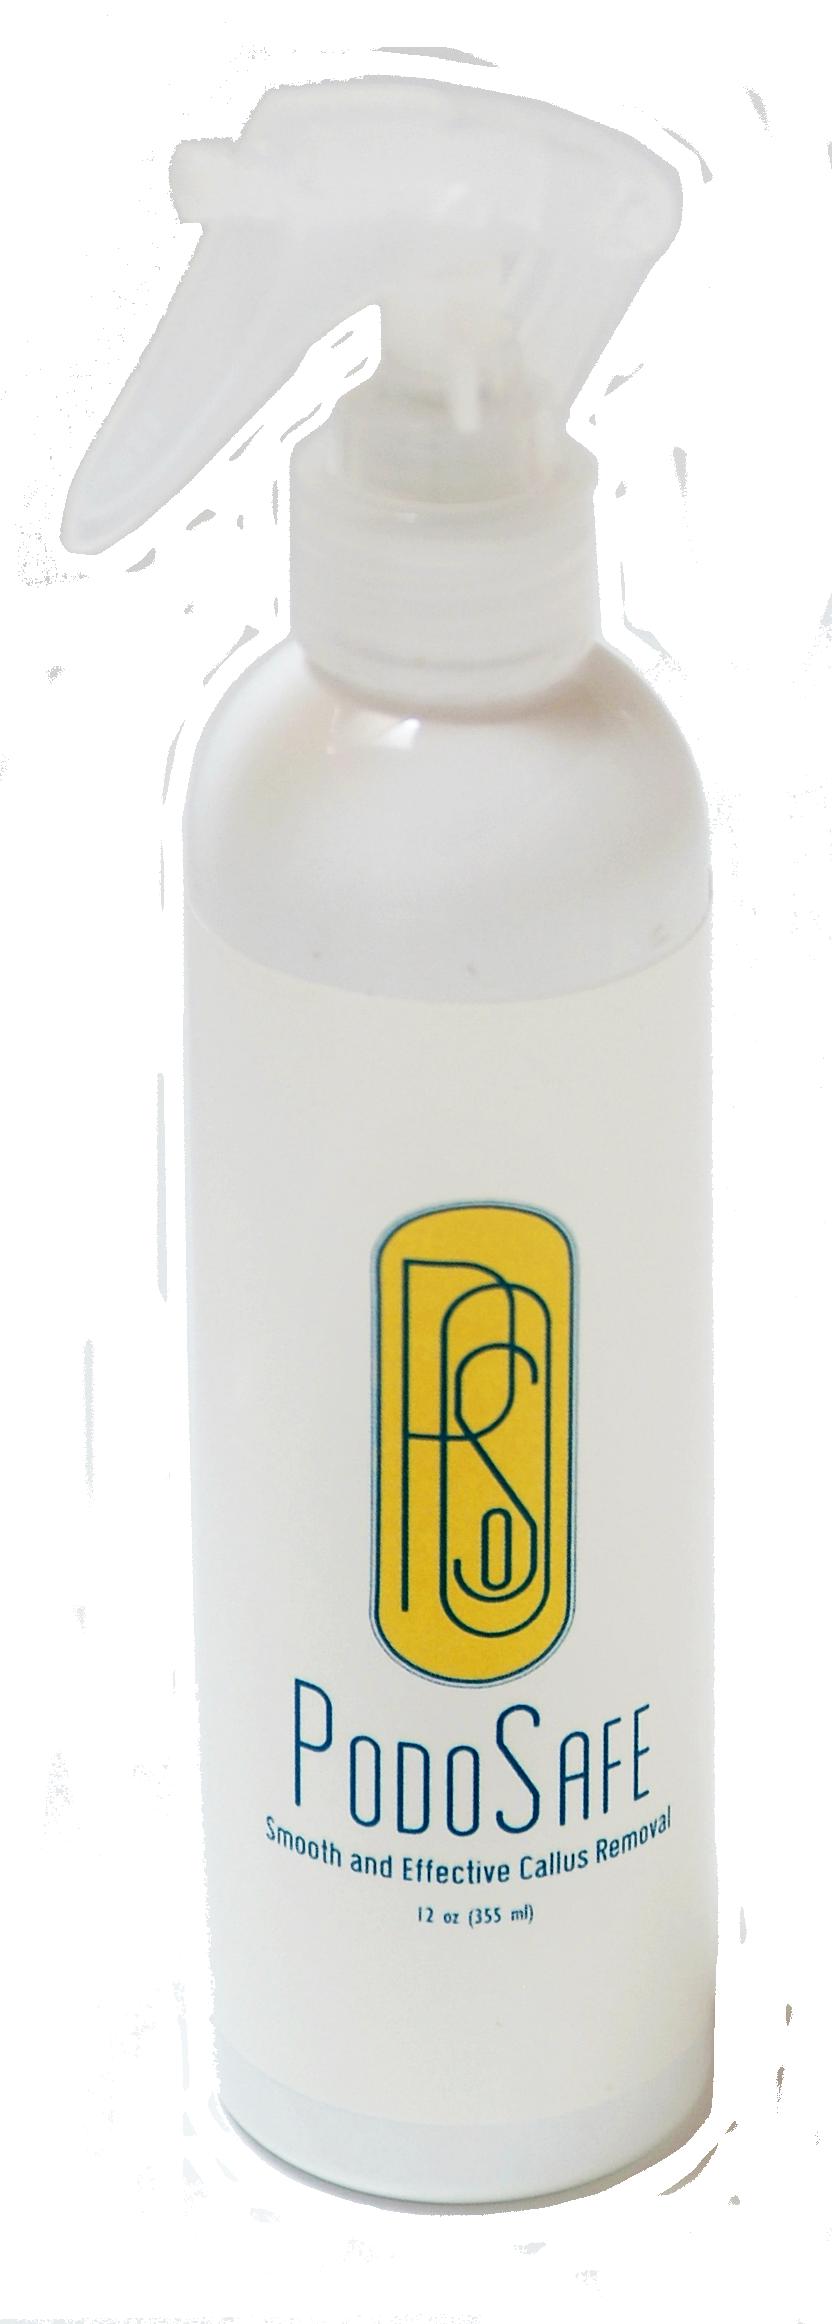 PodoSafe Callus Spray 12 oz Po01